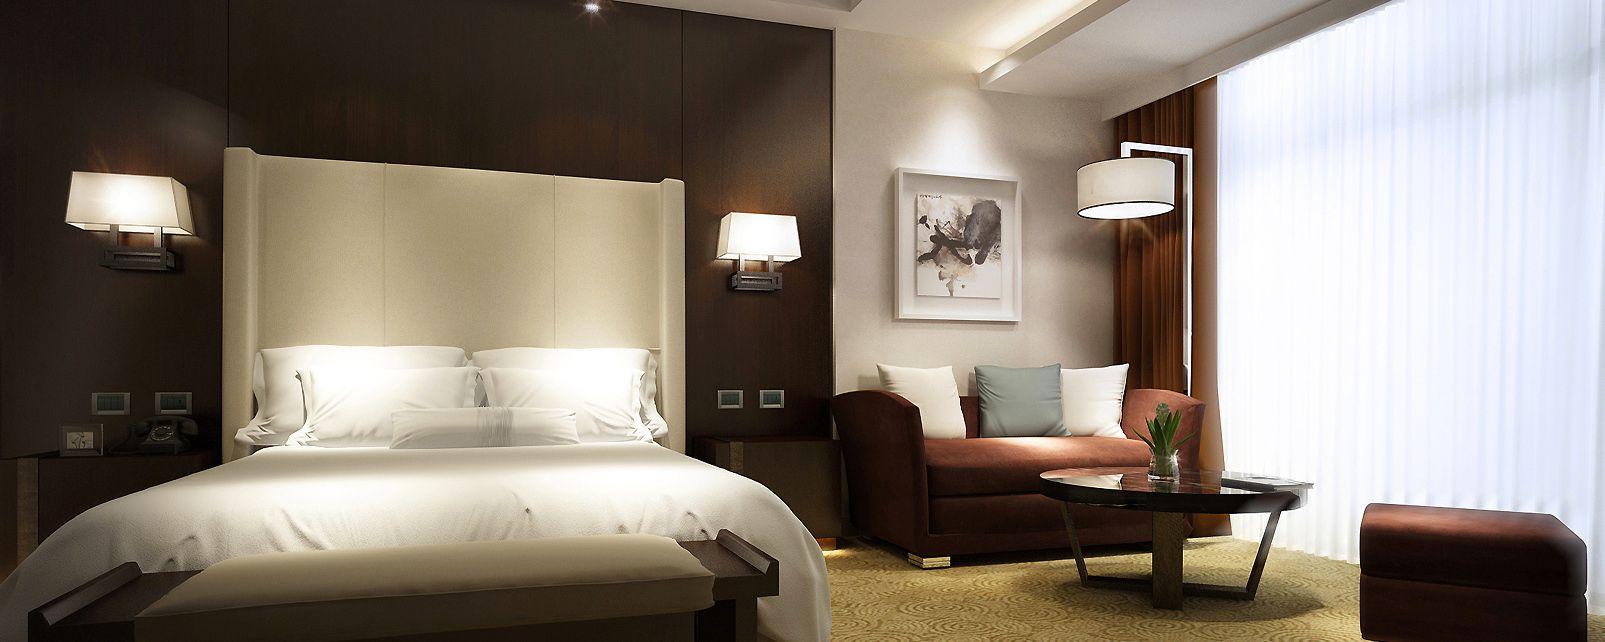 Hôtel Jw Marriott Hotel Beijing Central